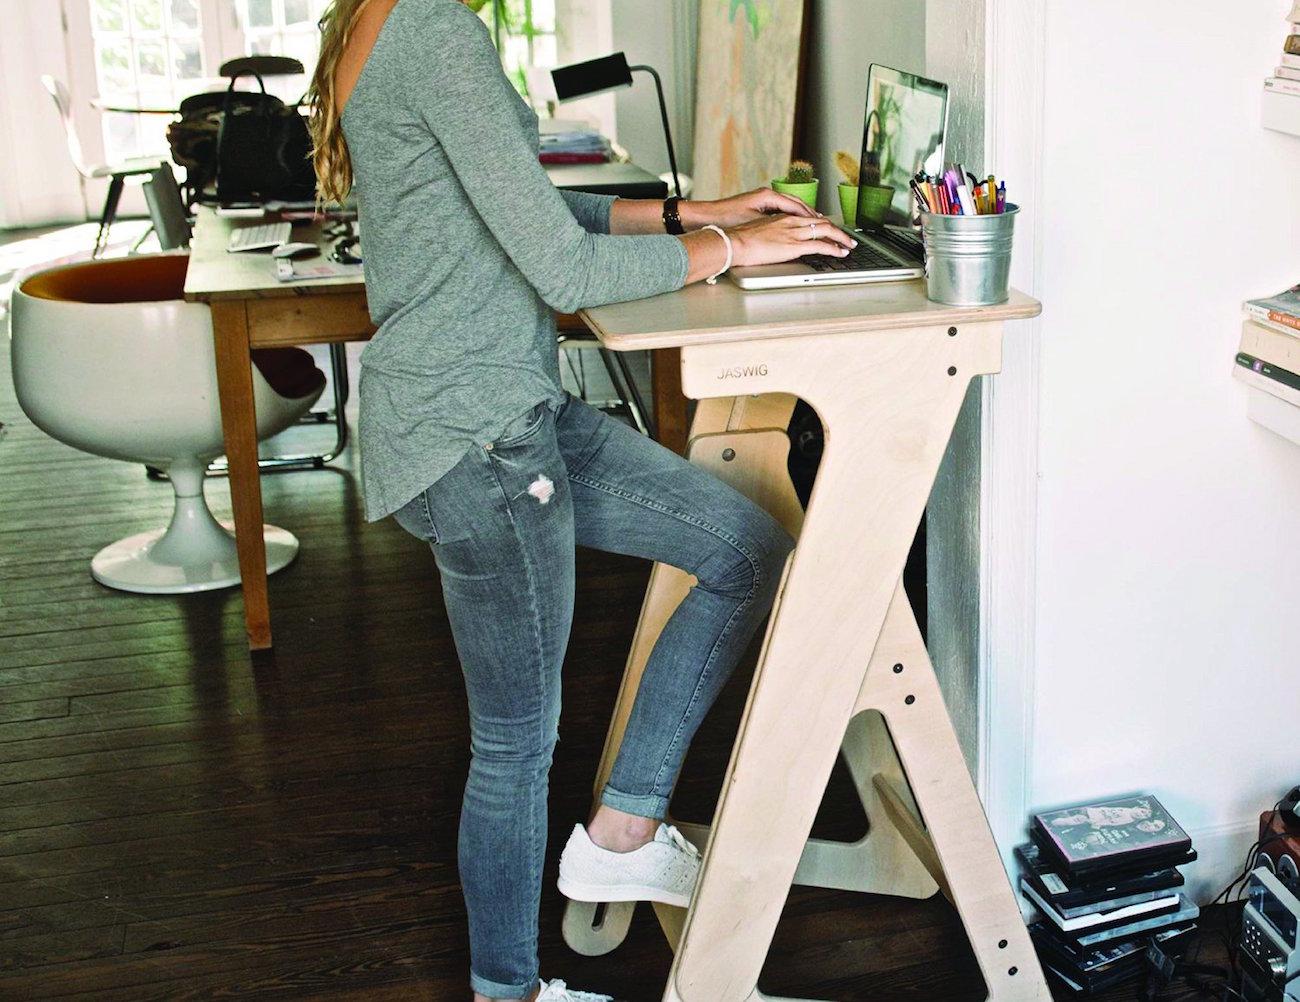 jaswig-standup-height-adjustable-desk-04